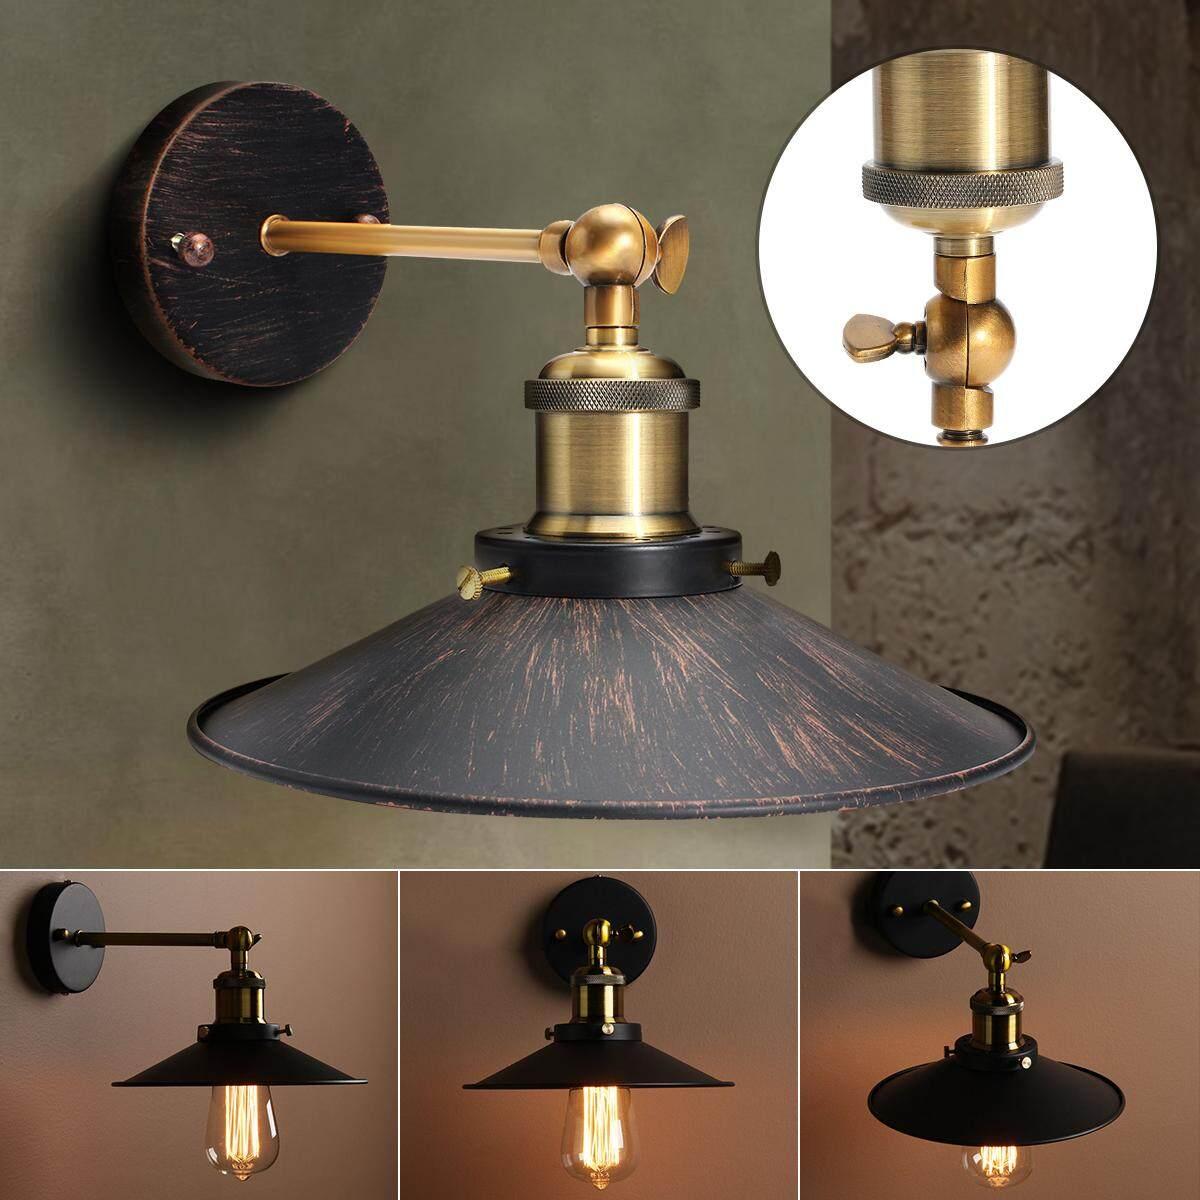 E27 Retro Metal Hanging Lampshade Edison Wall Light Sconce Lamp Holder Socket - intl